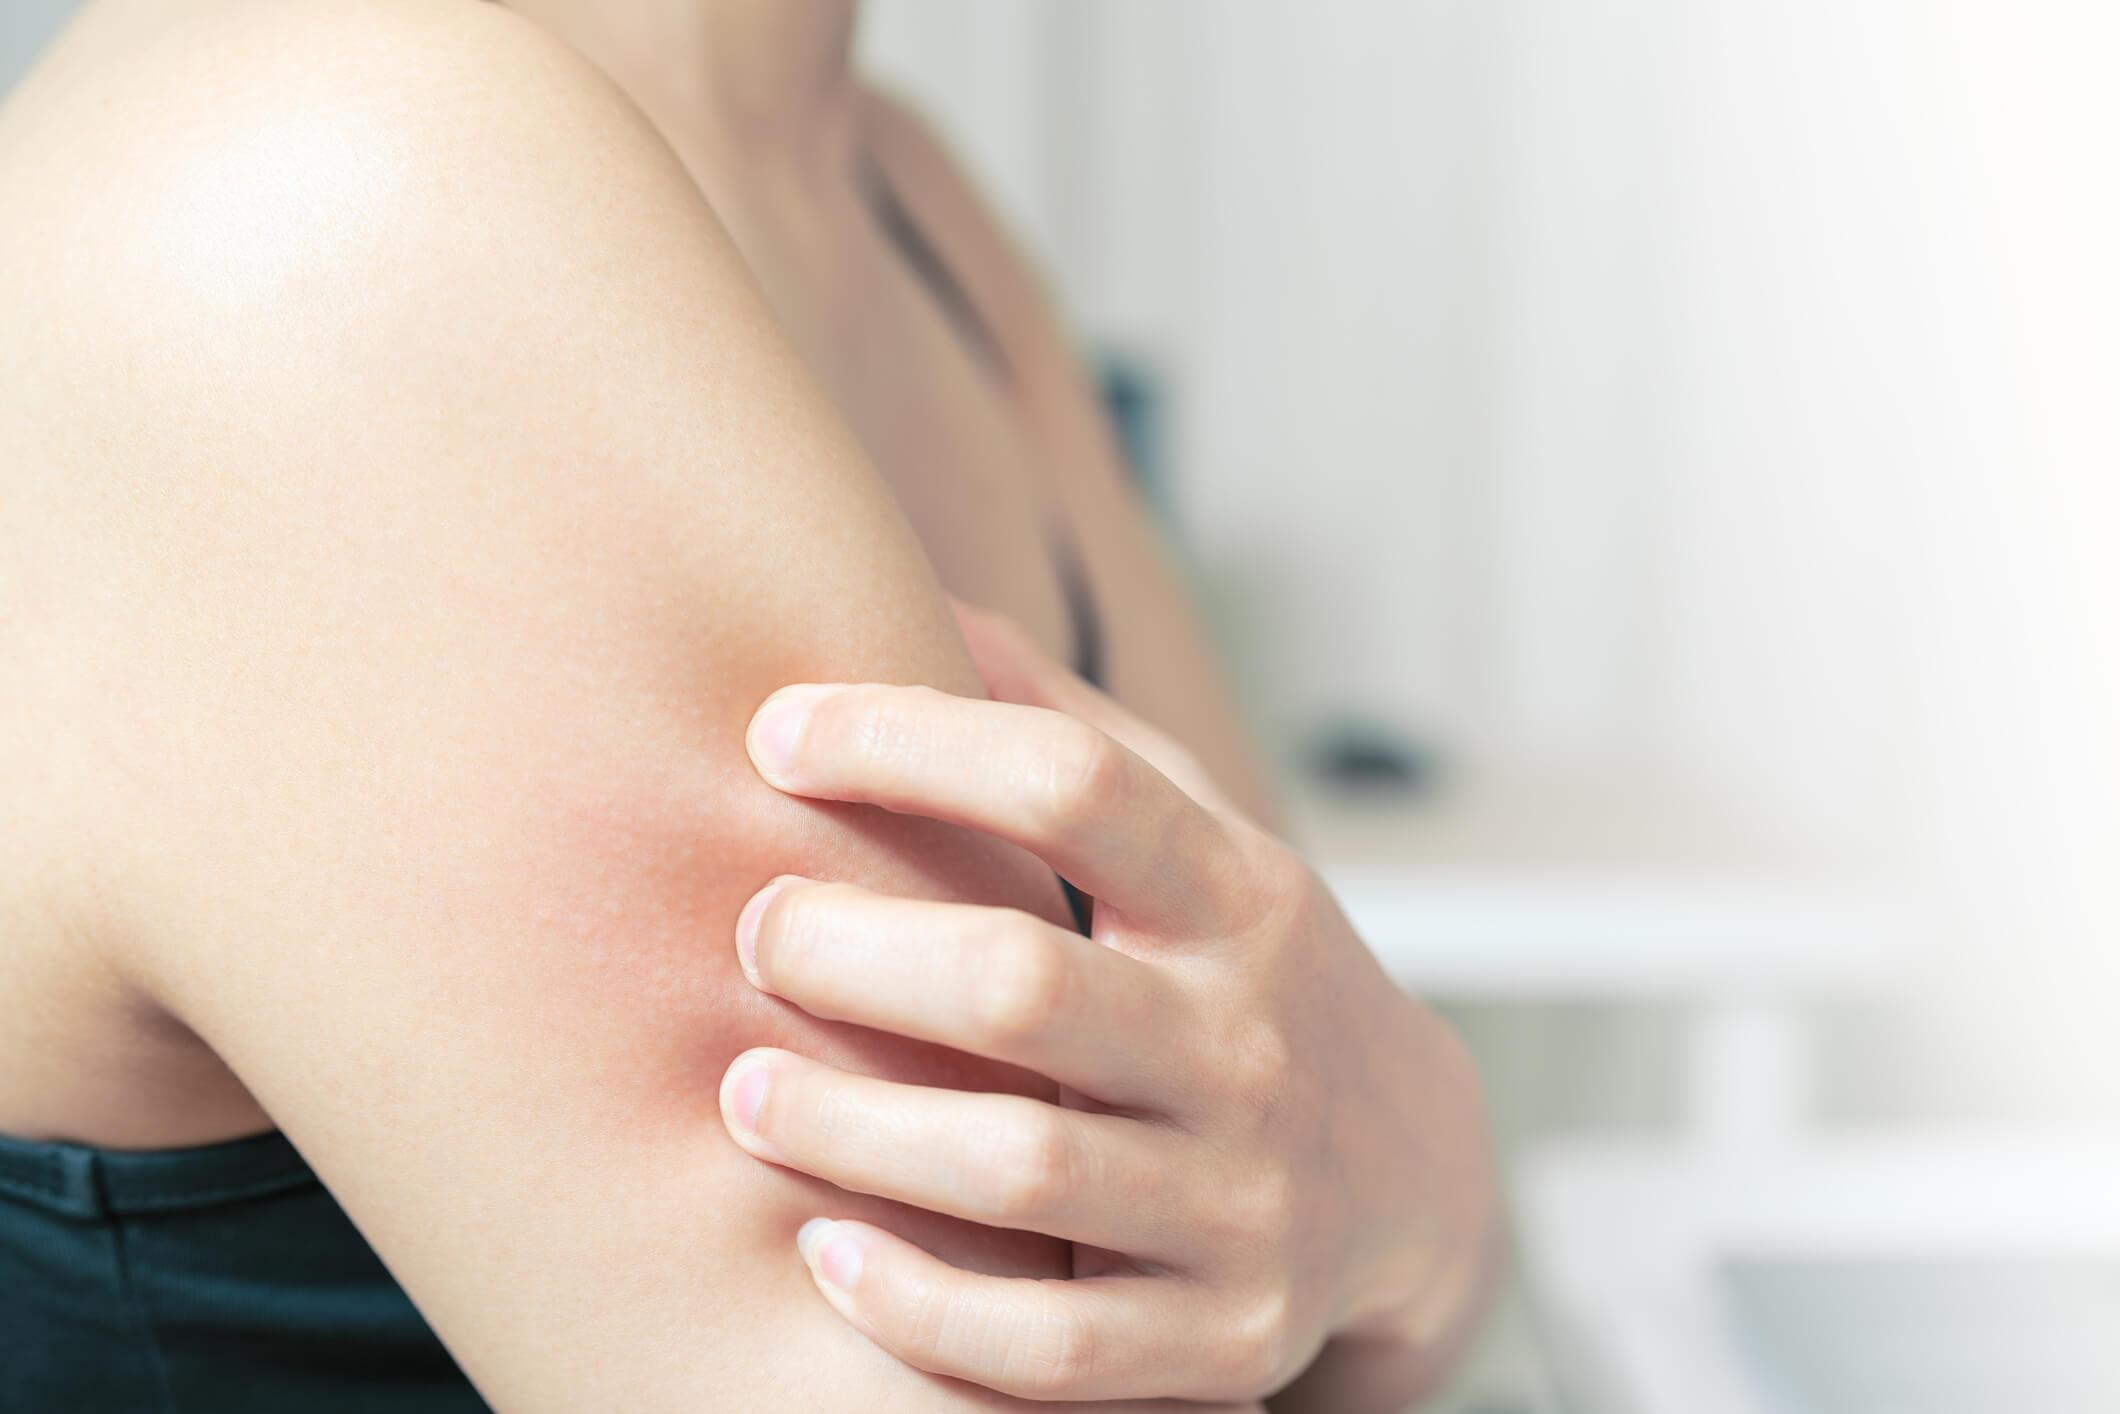 4-sintomas-para-identificar-uma-possivel-alergia-alimentar.jpeg